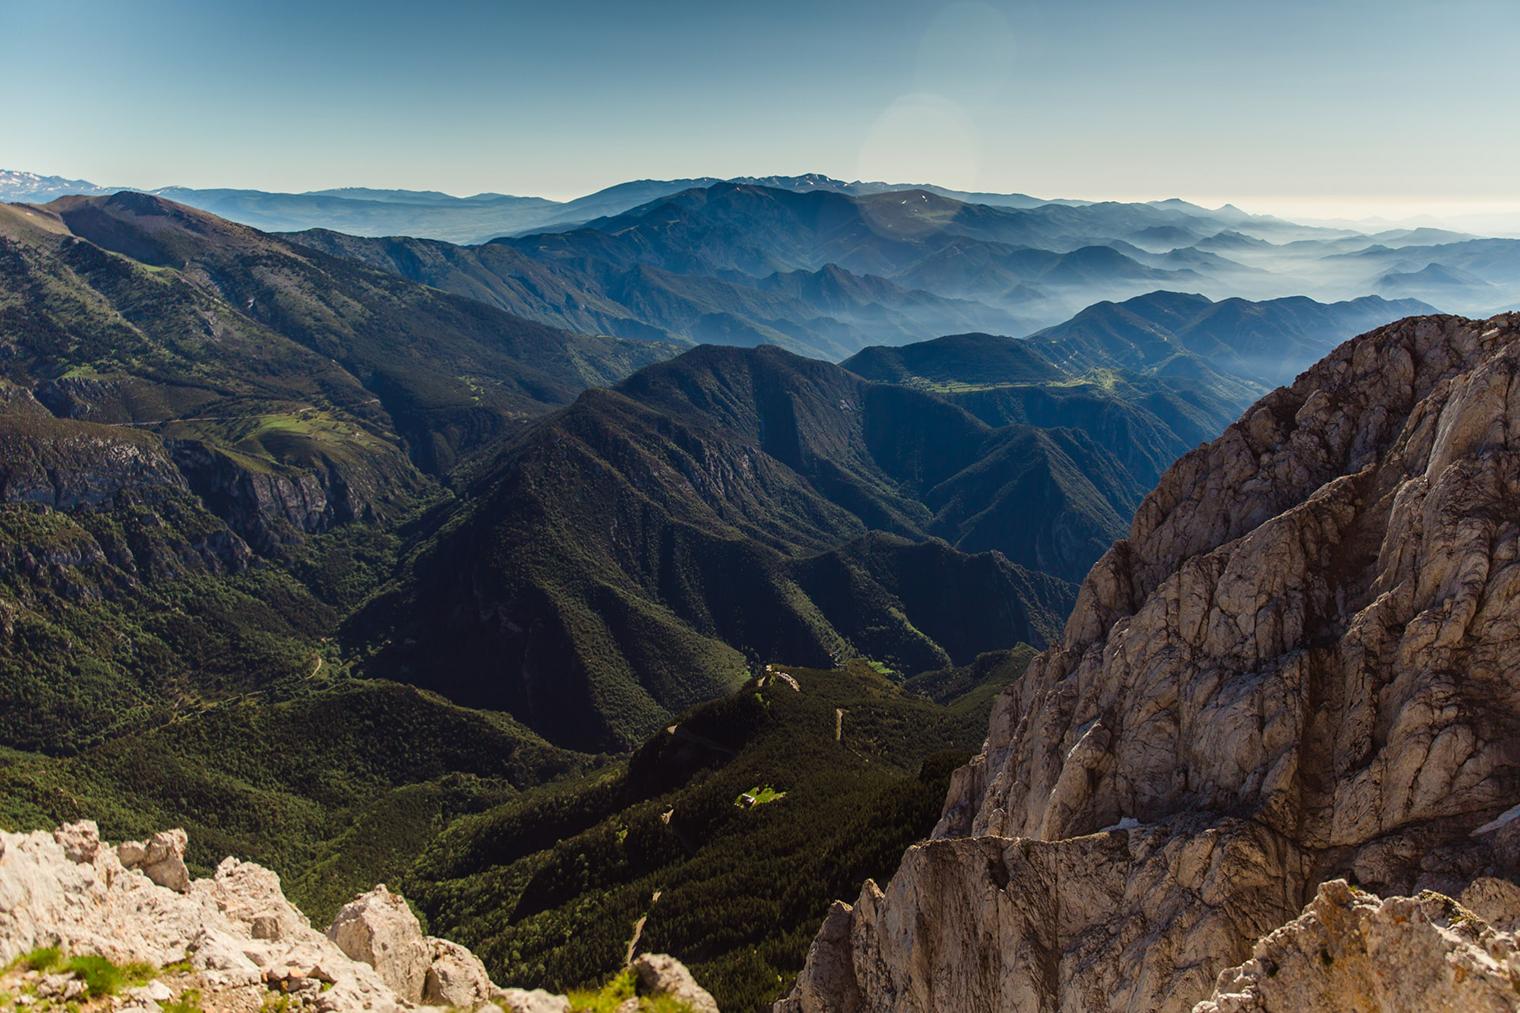 Sierra del Cadí-Moixeró